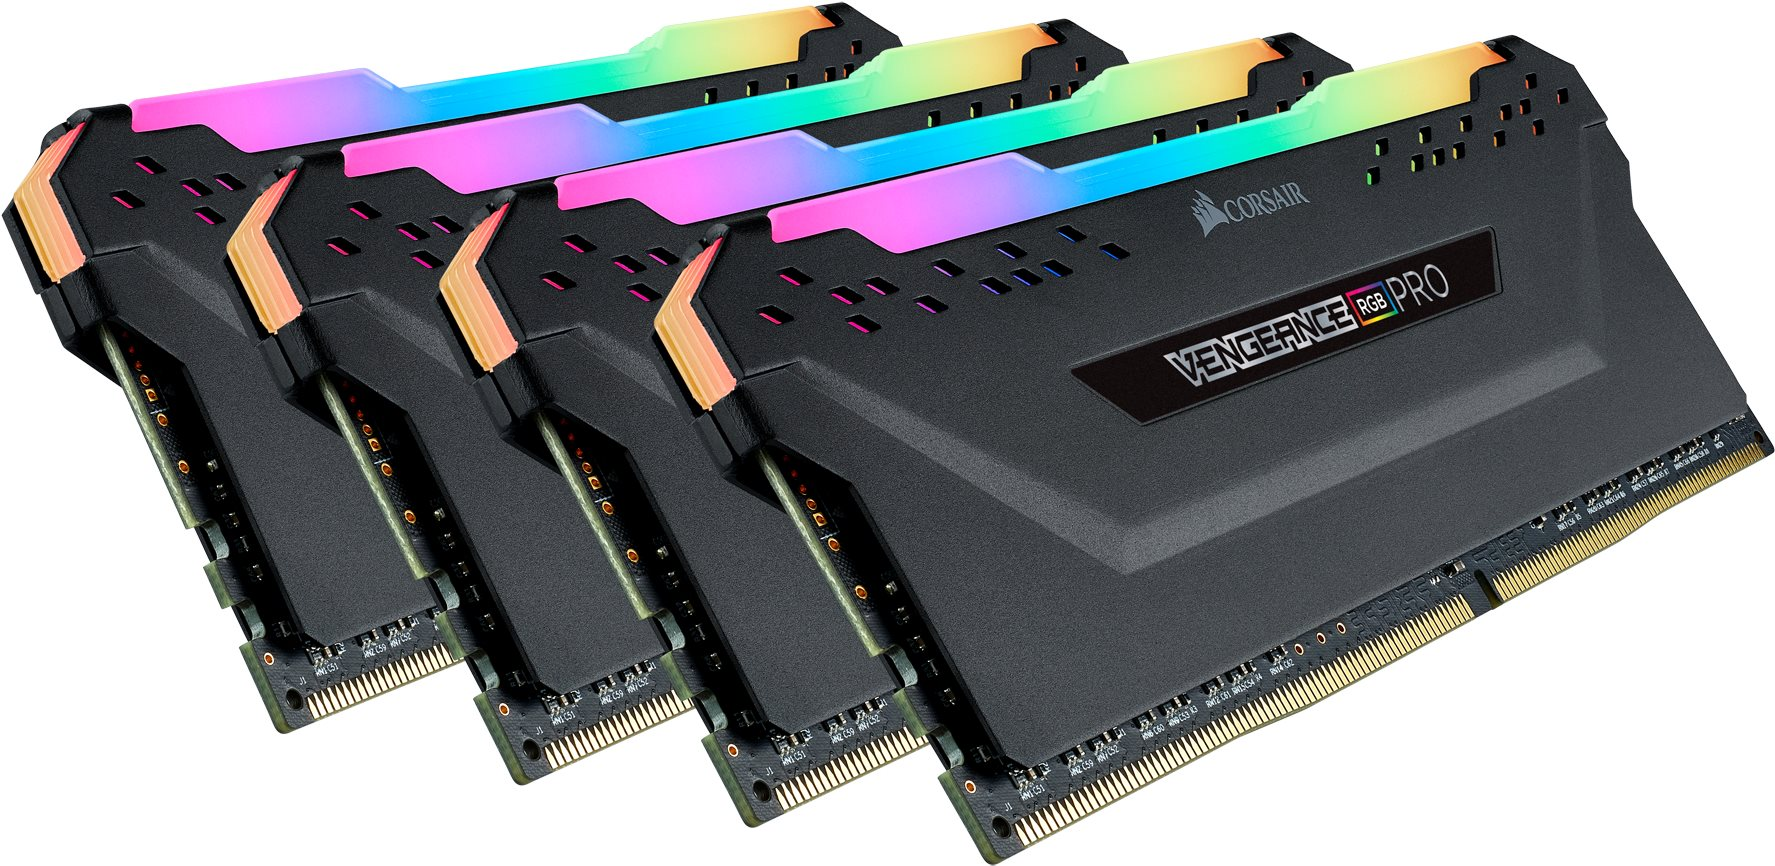 Corsair 64GB KIT DDR4 3200MHz CL16 Vengeance RGB PRO - fekete